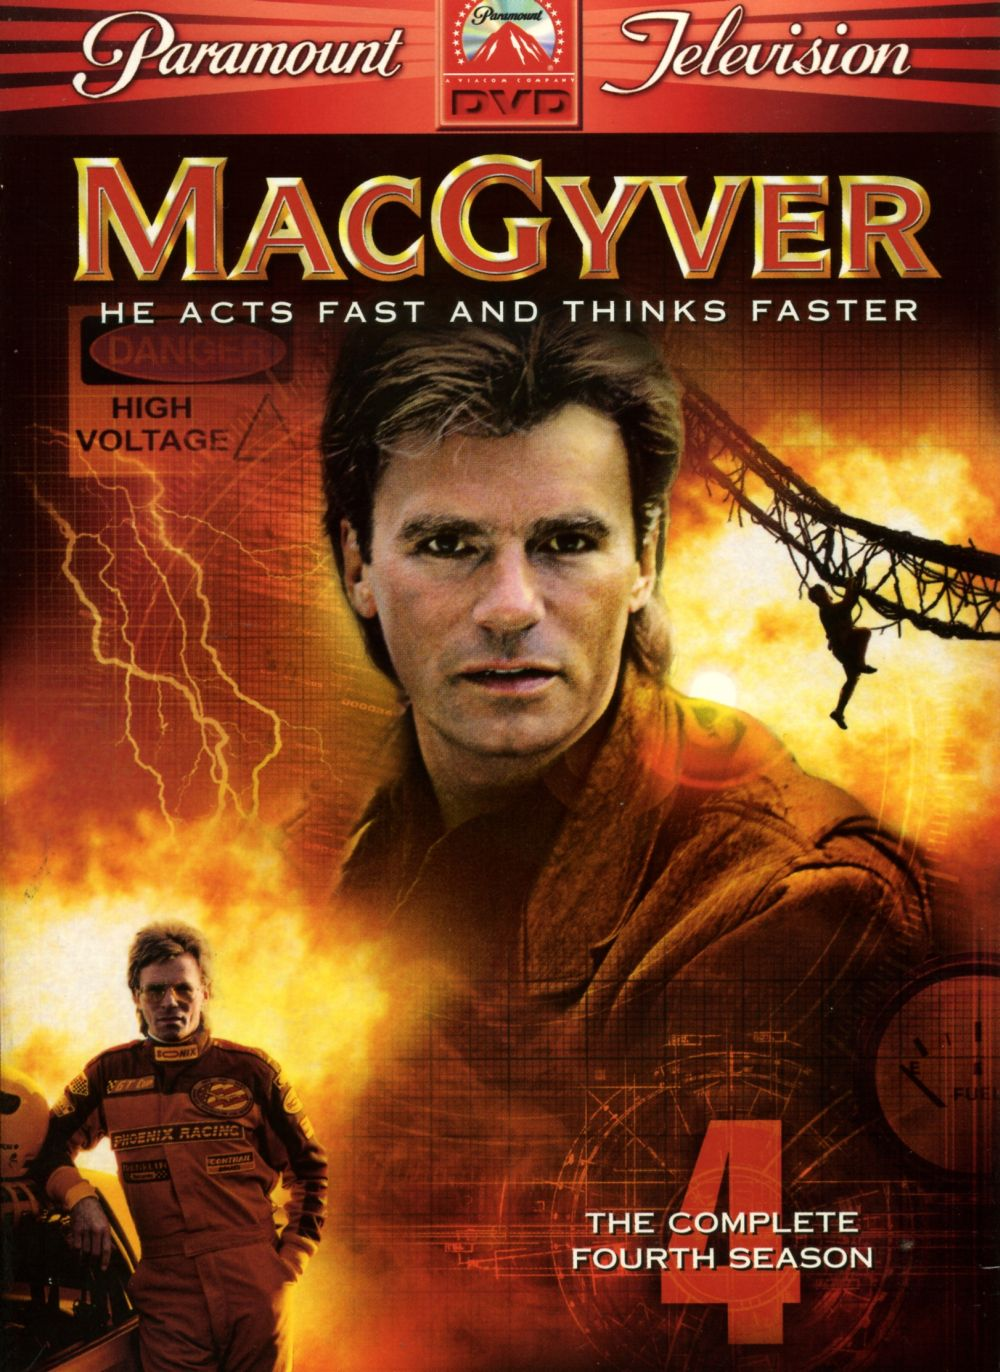 Season 4 1985 Macgyver Wiki Fandom